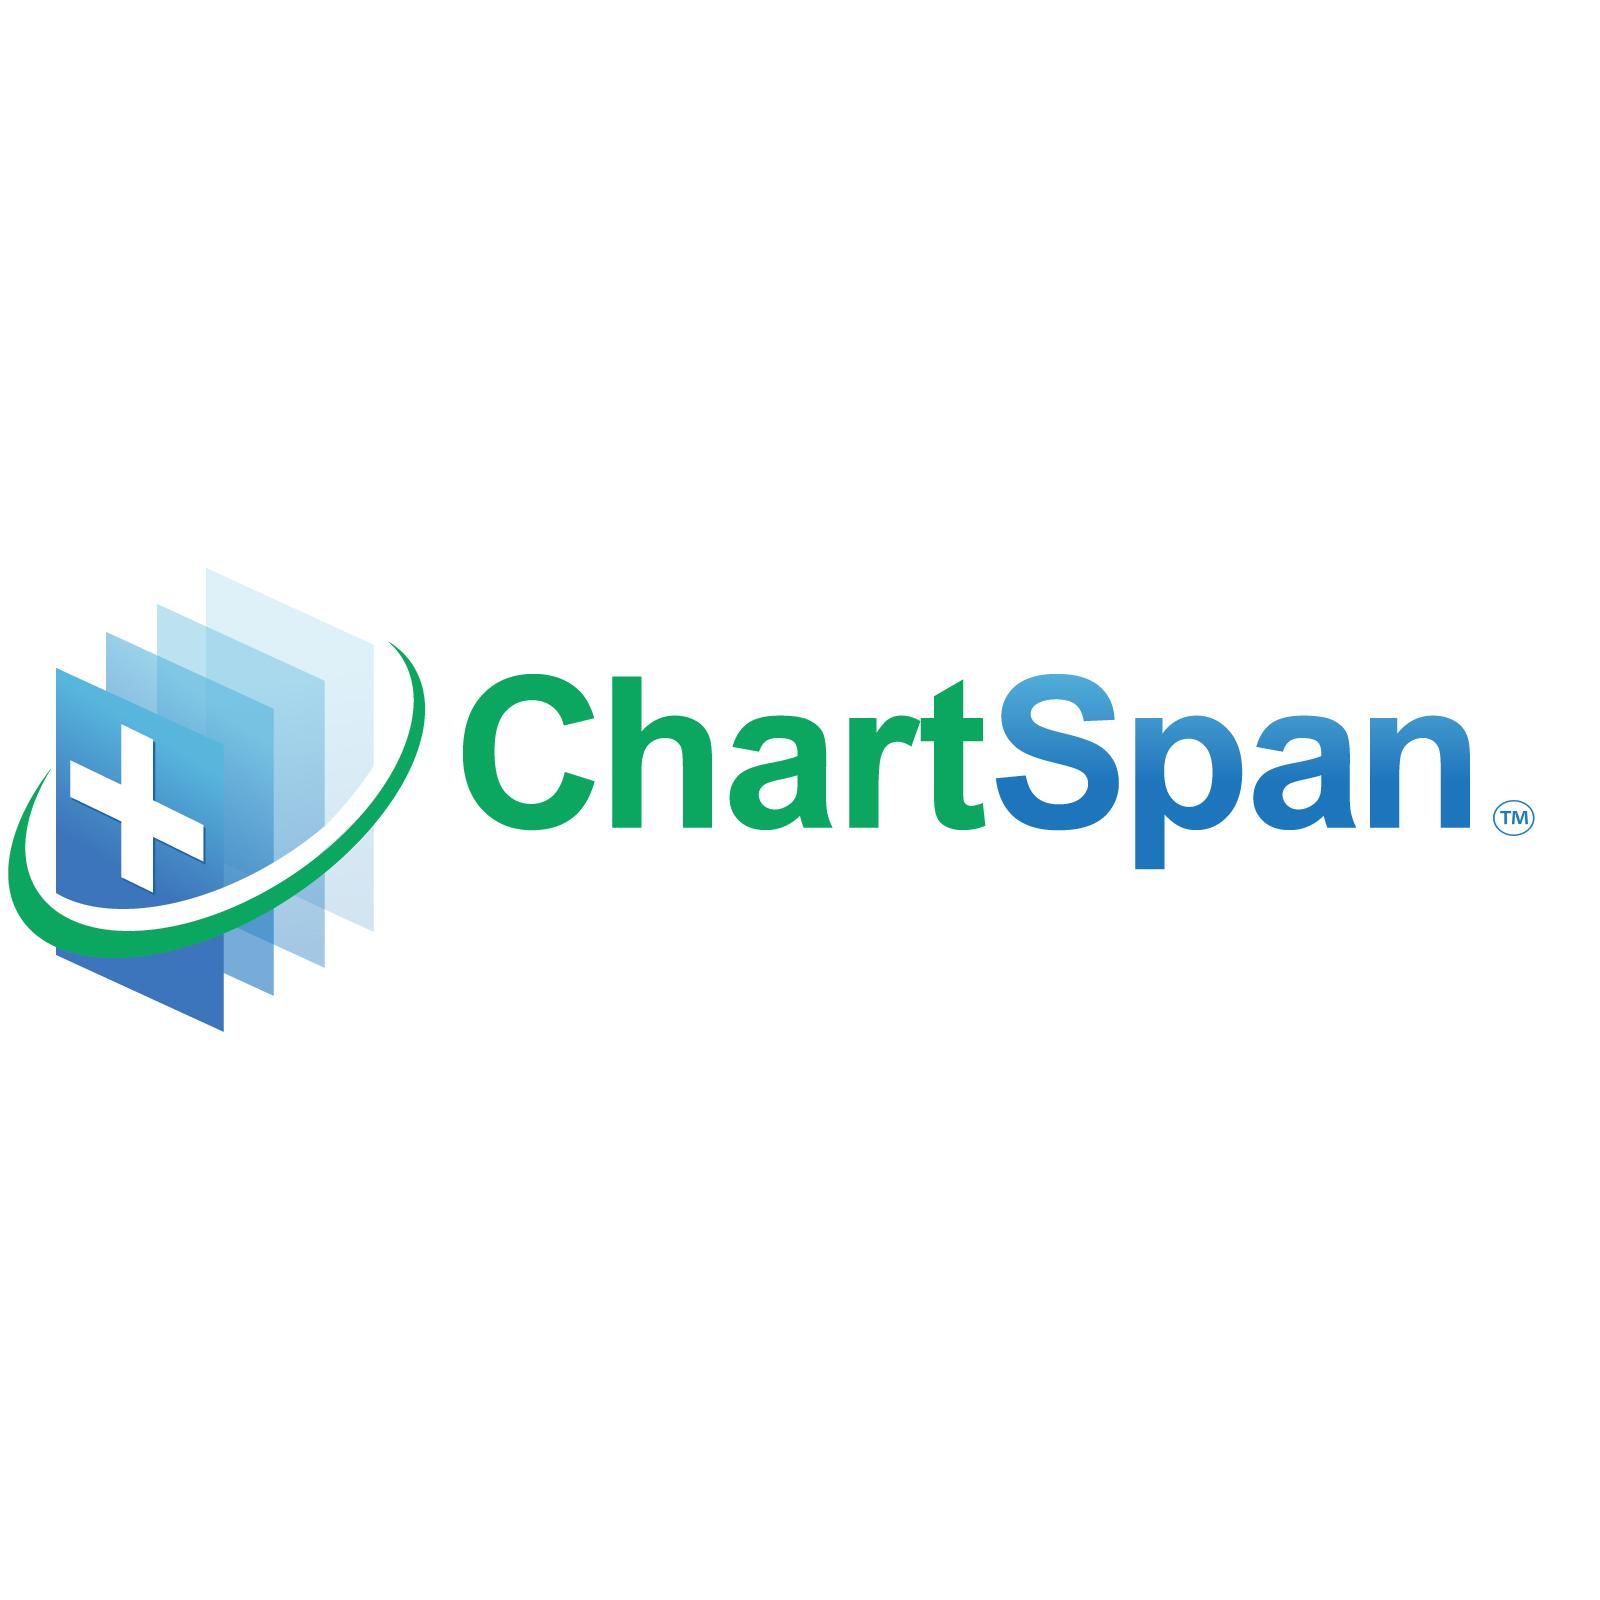 ChartSpan